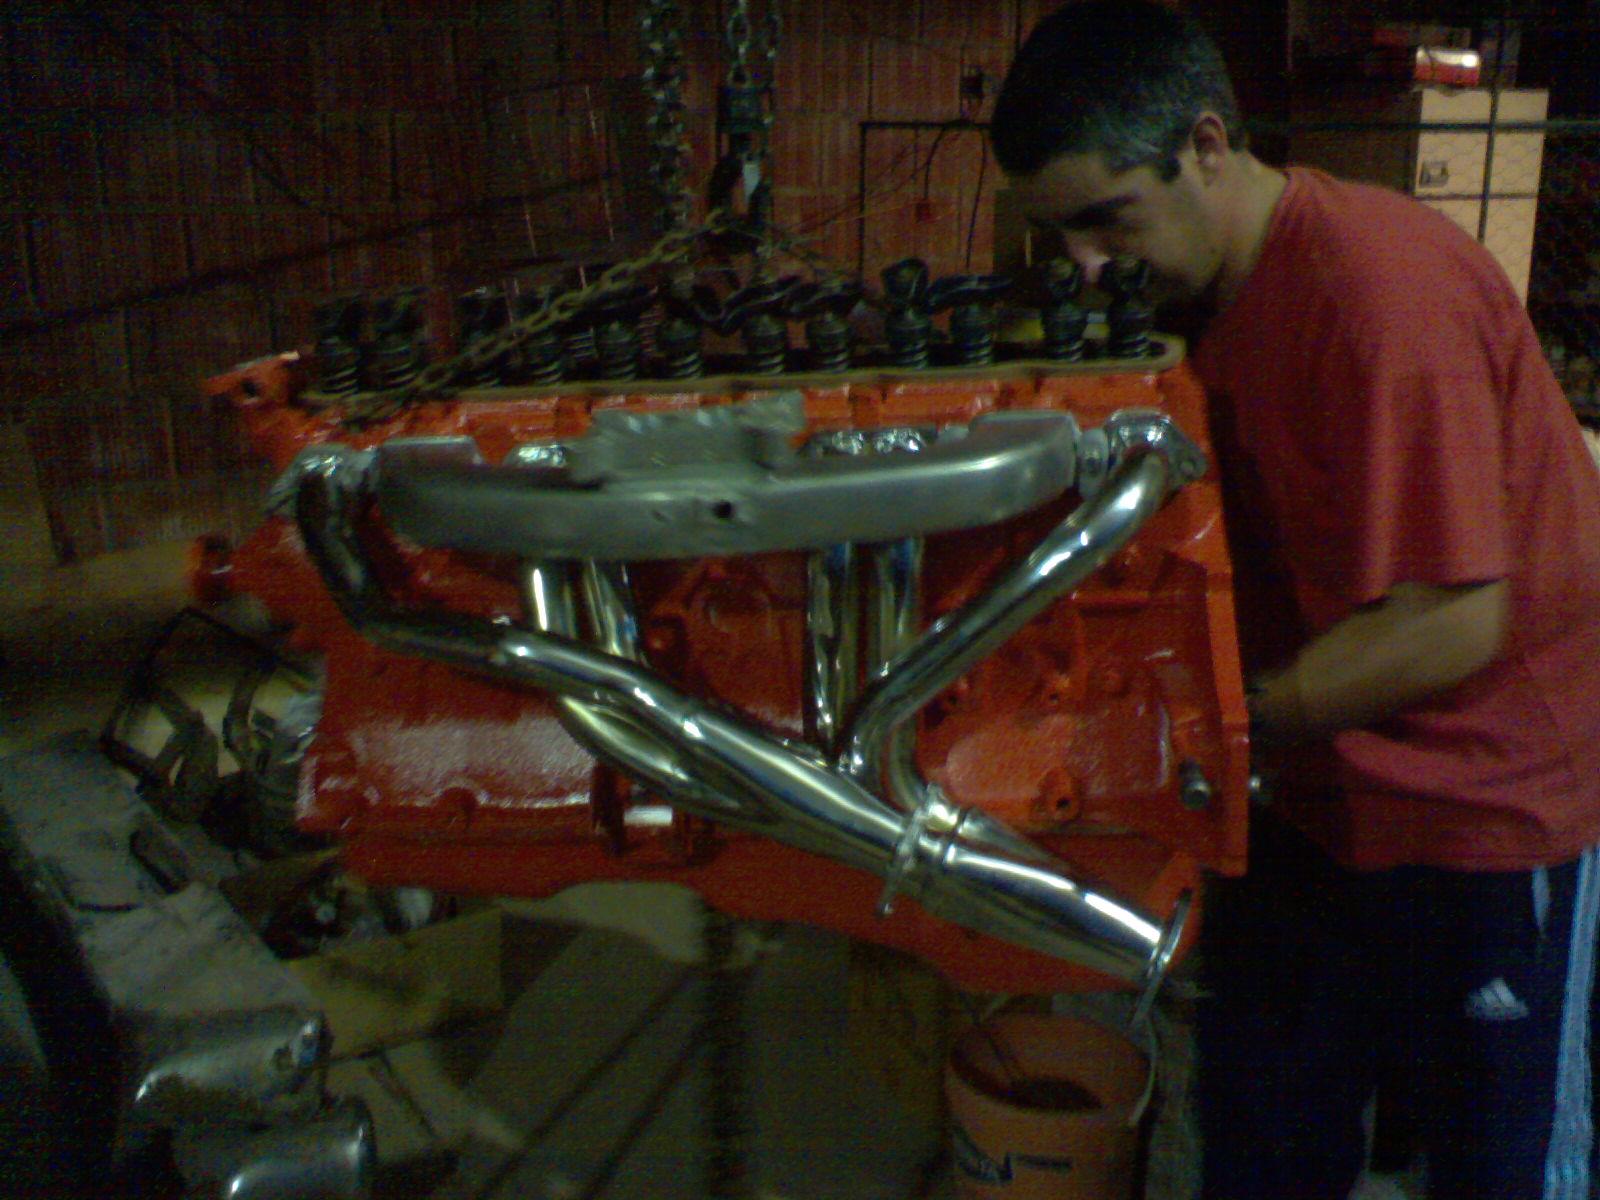 81858_Motor_6_122_438lo.jpg